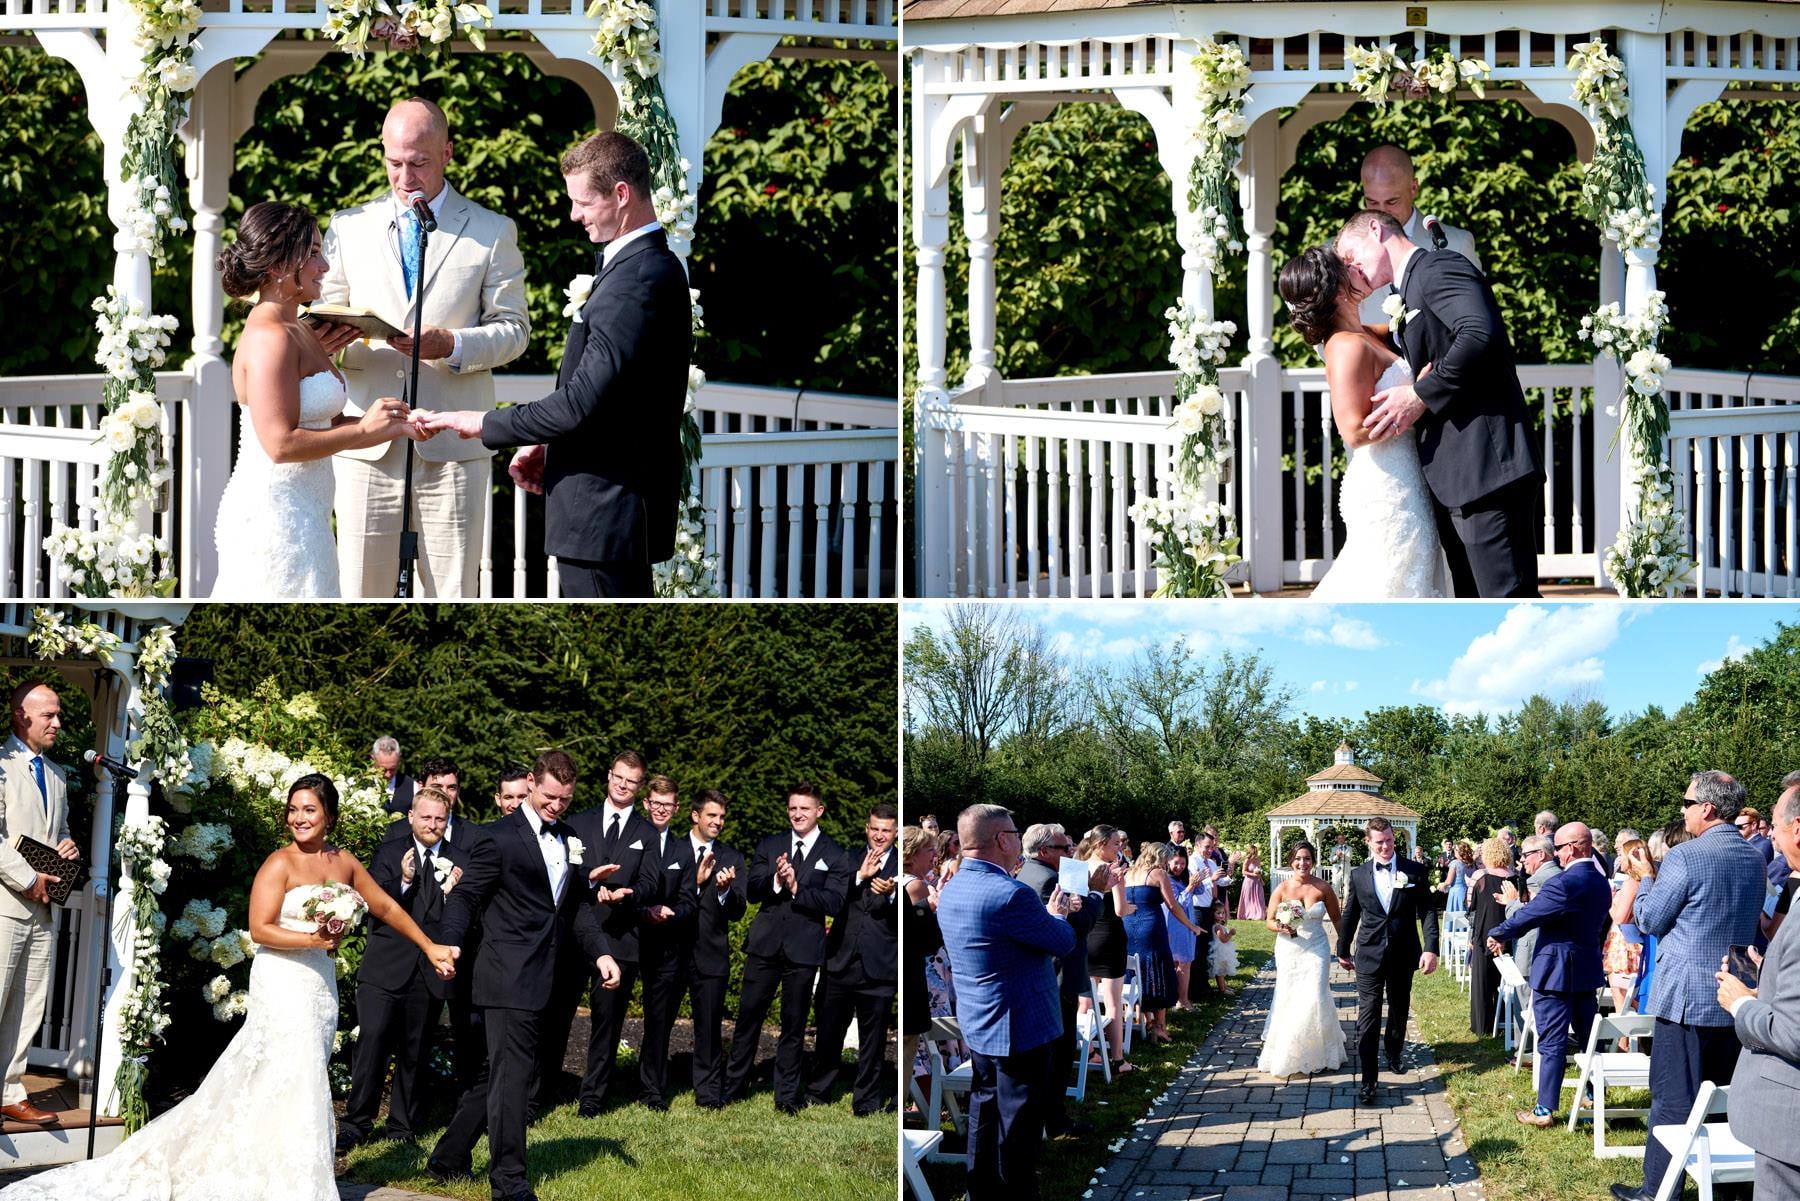 first kiss wedding ceremony photos at The Farmhouse